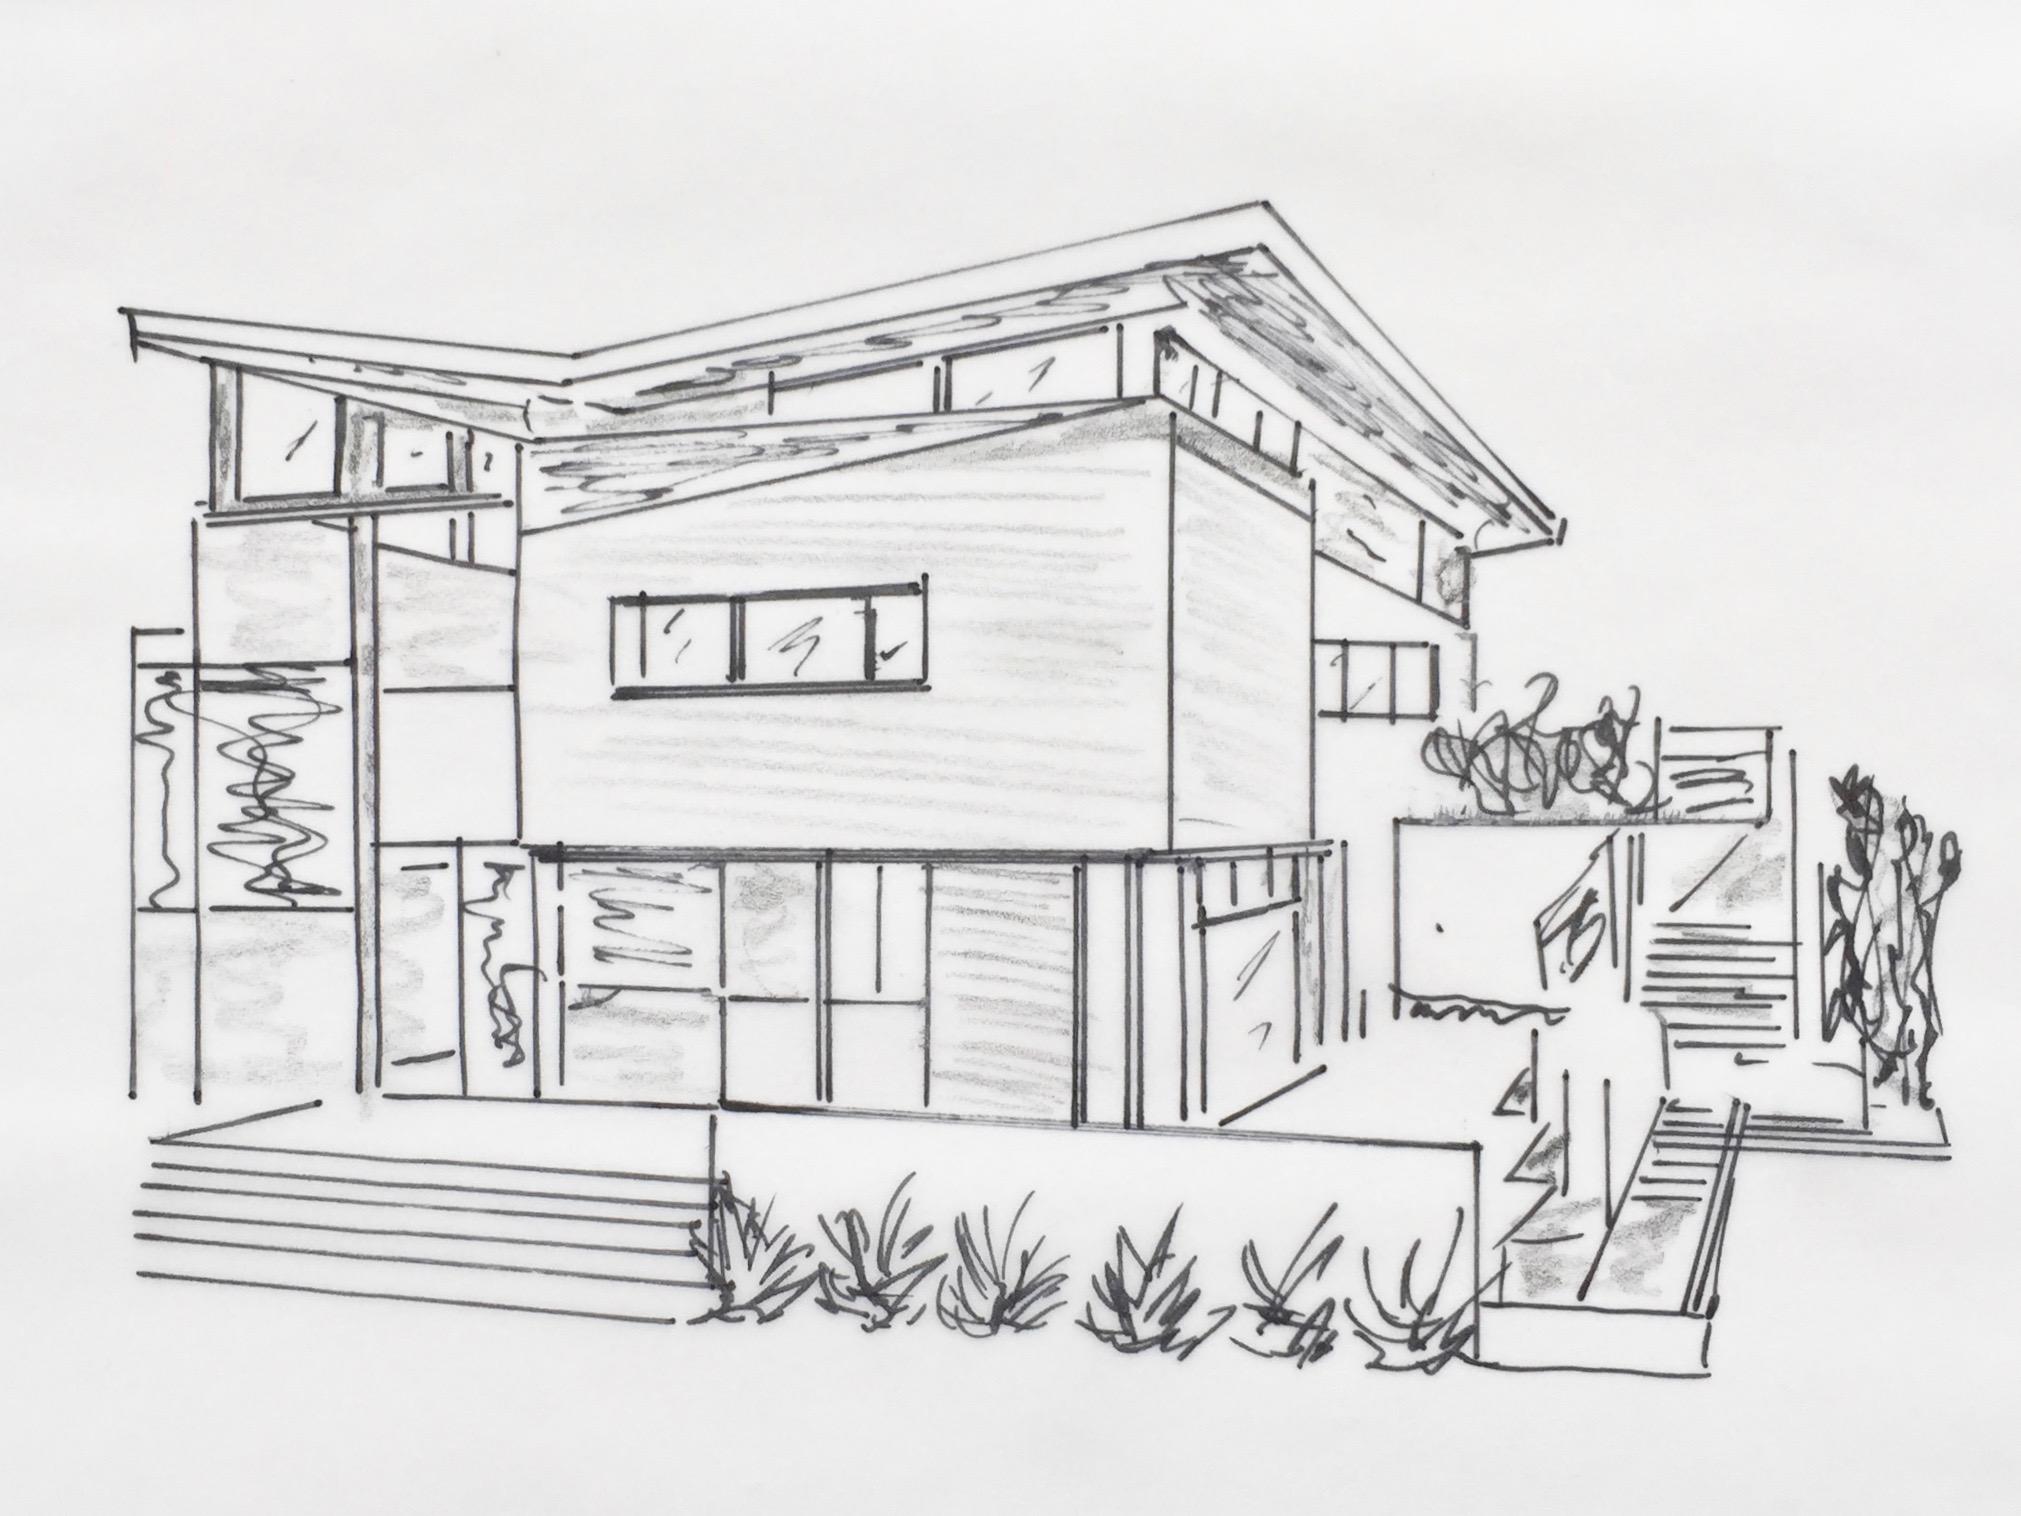 Baufinanzierung –Skizze Eigenheim